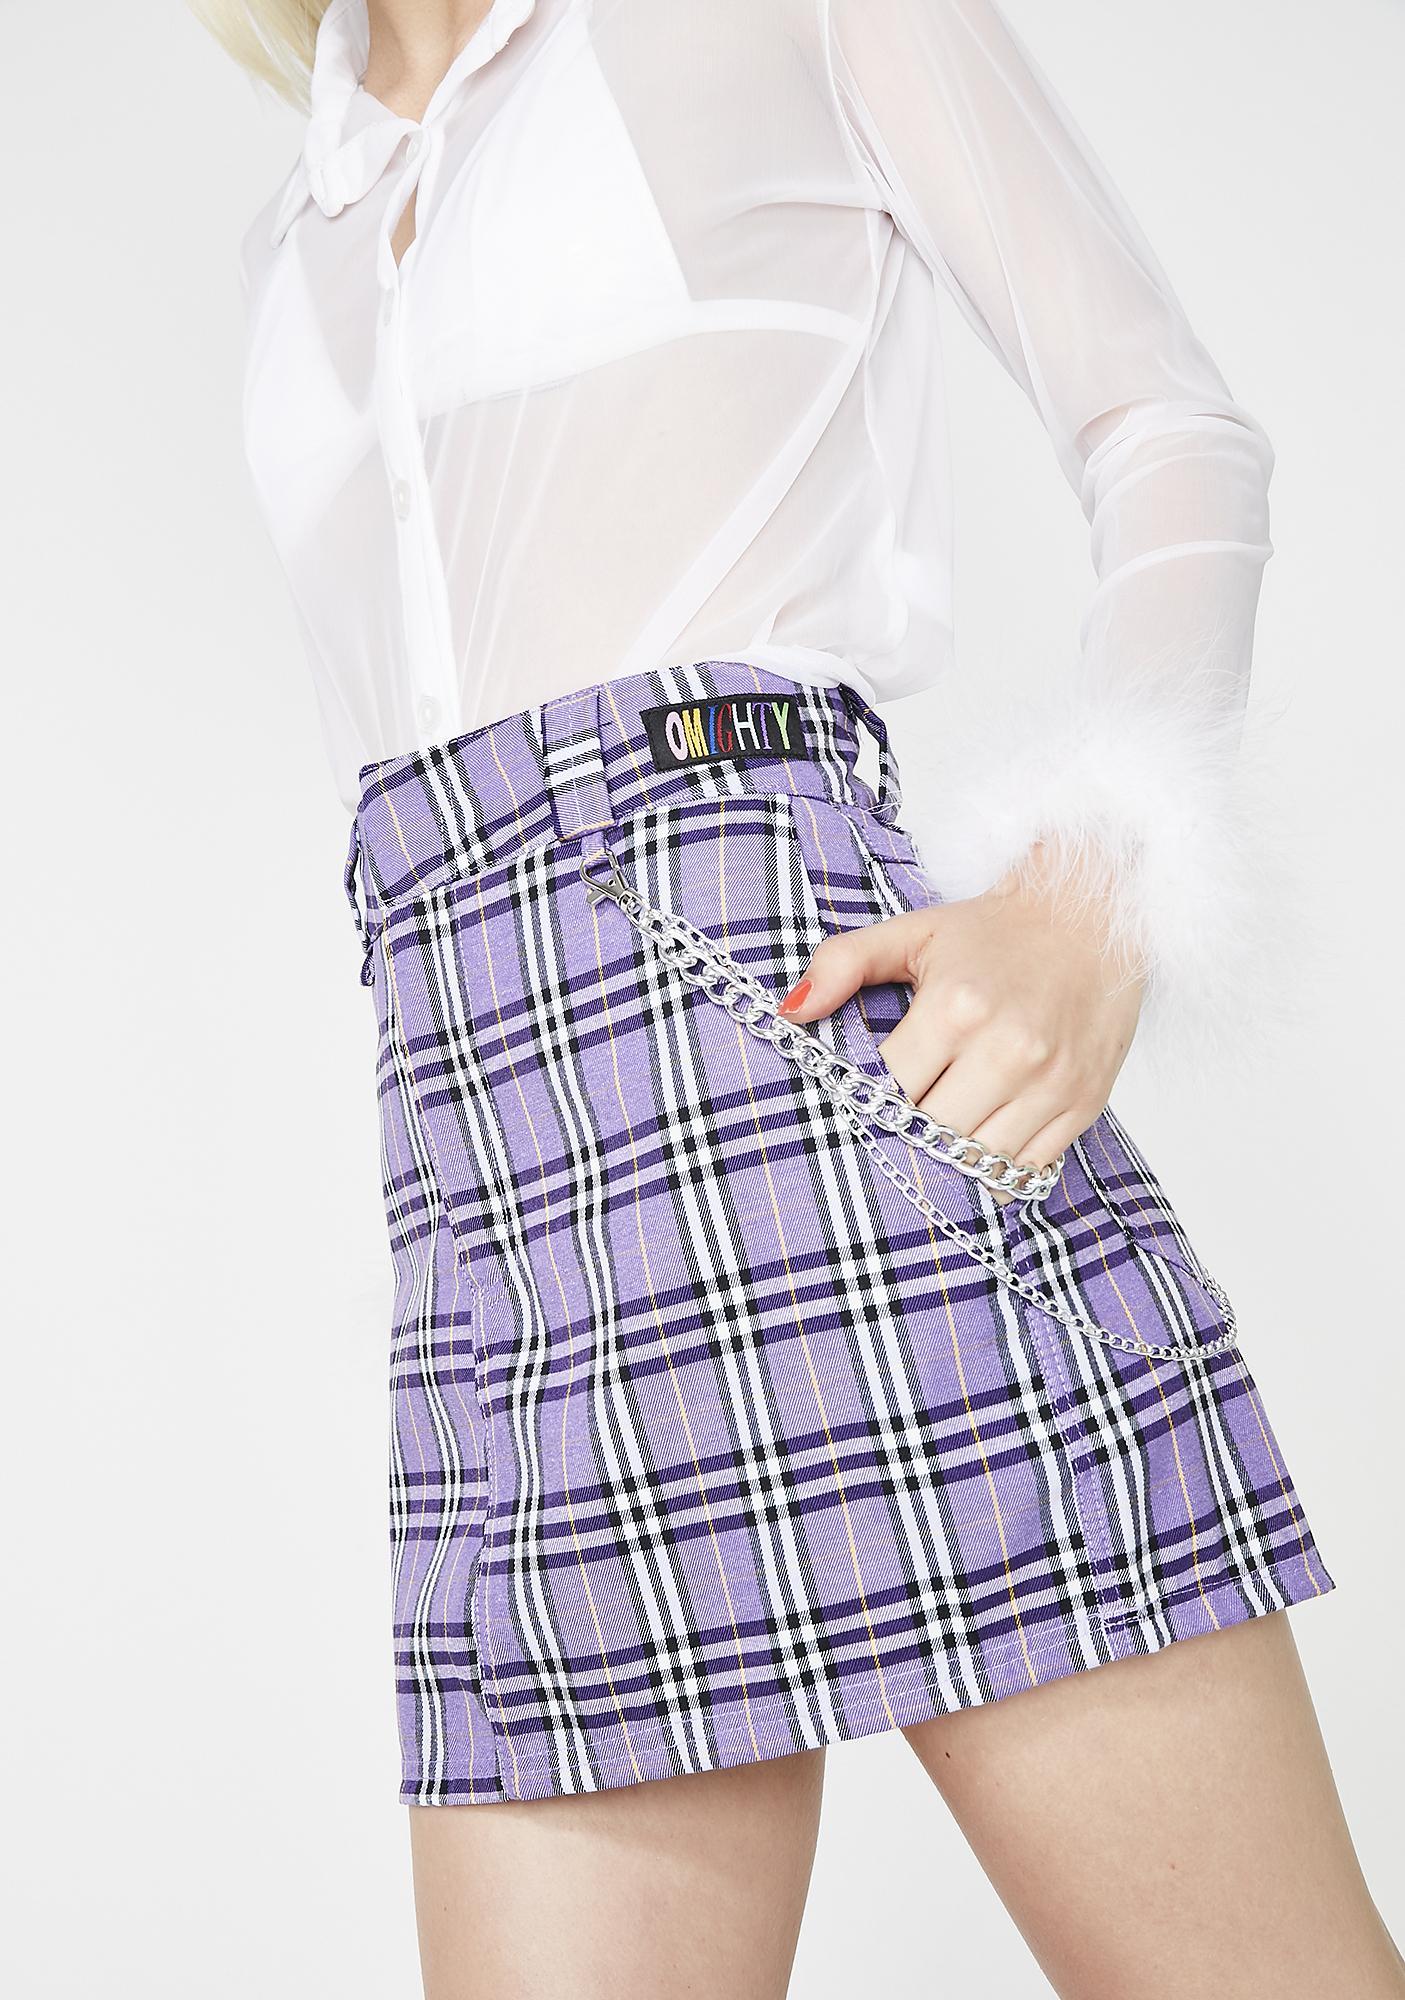 O Mighty Daphne Chain Skirt